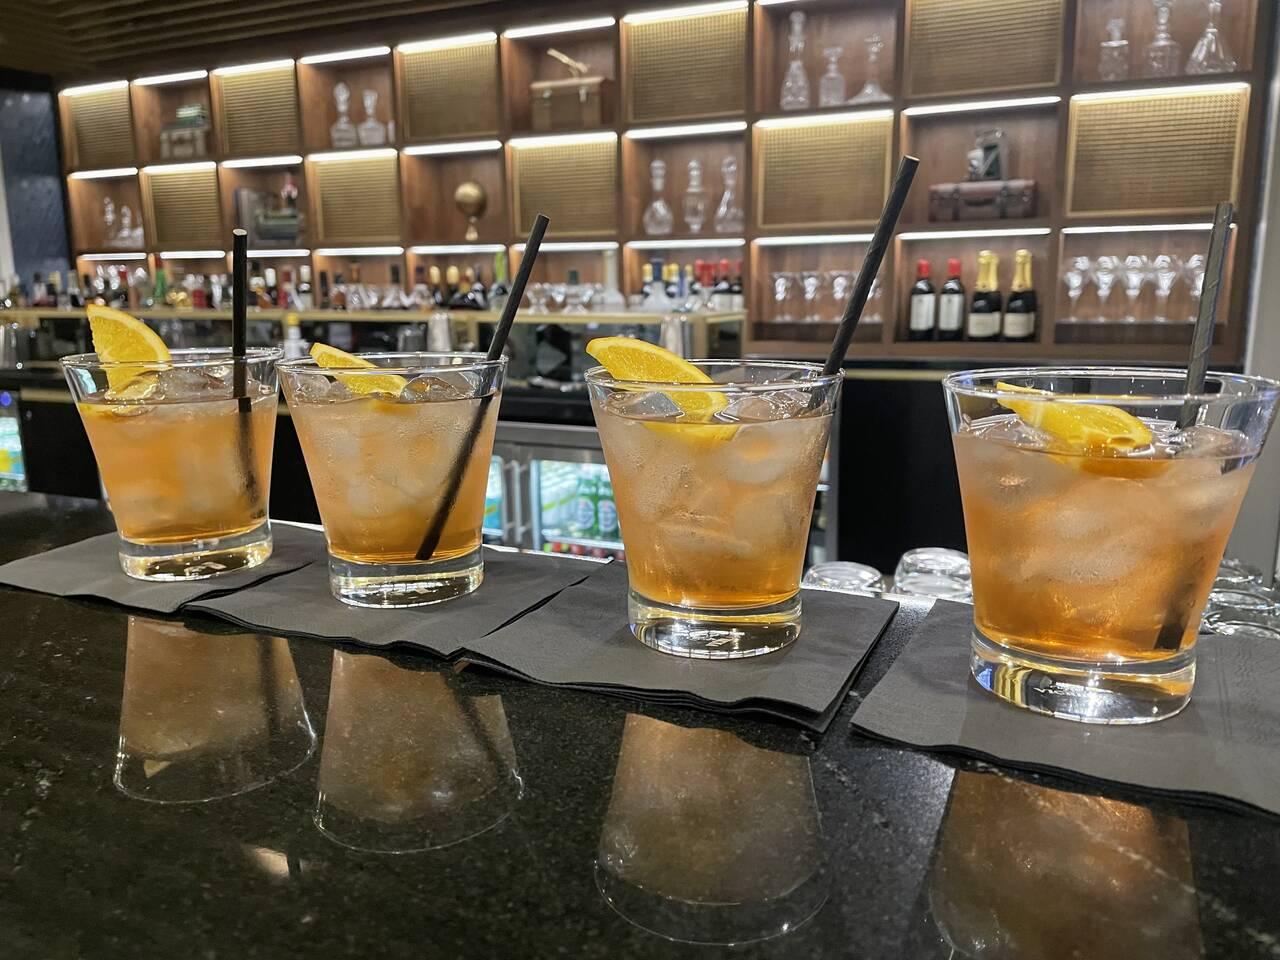 American Express Centurion Lounge Heathrow Airport bar